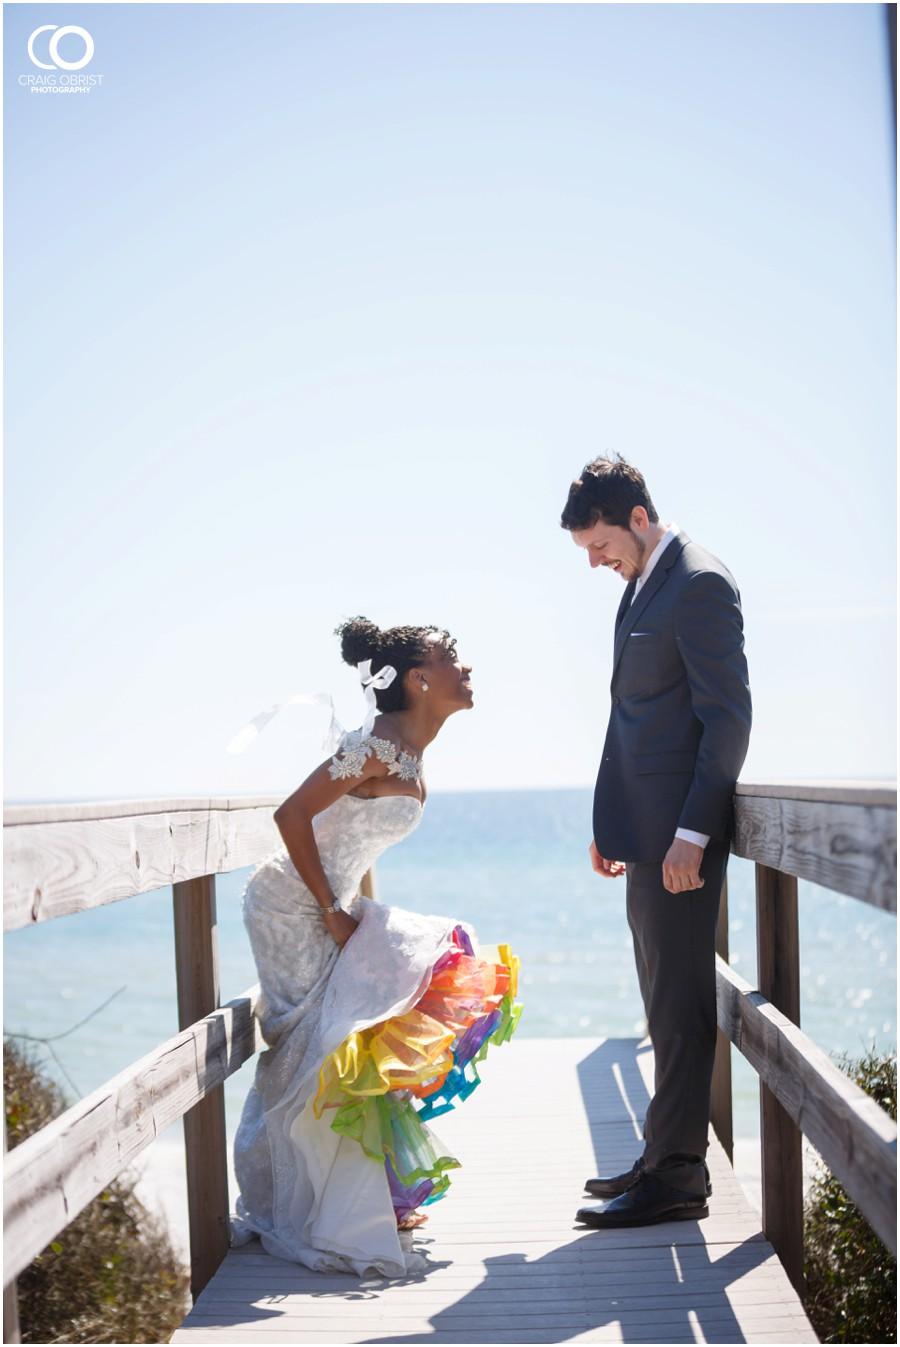 Seaside-30A-Beachside-Wedding-Sunset-Santa-Rosa-Photographer_0036.jpg